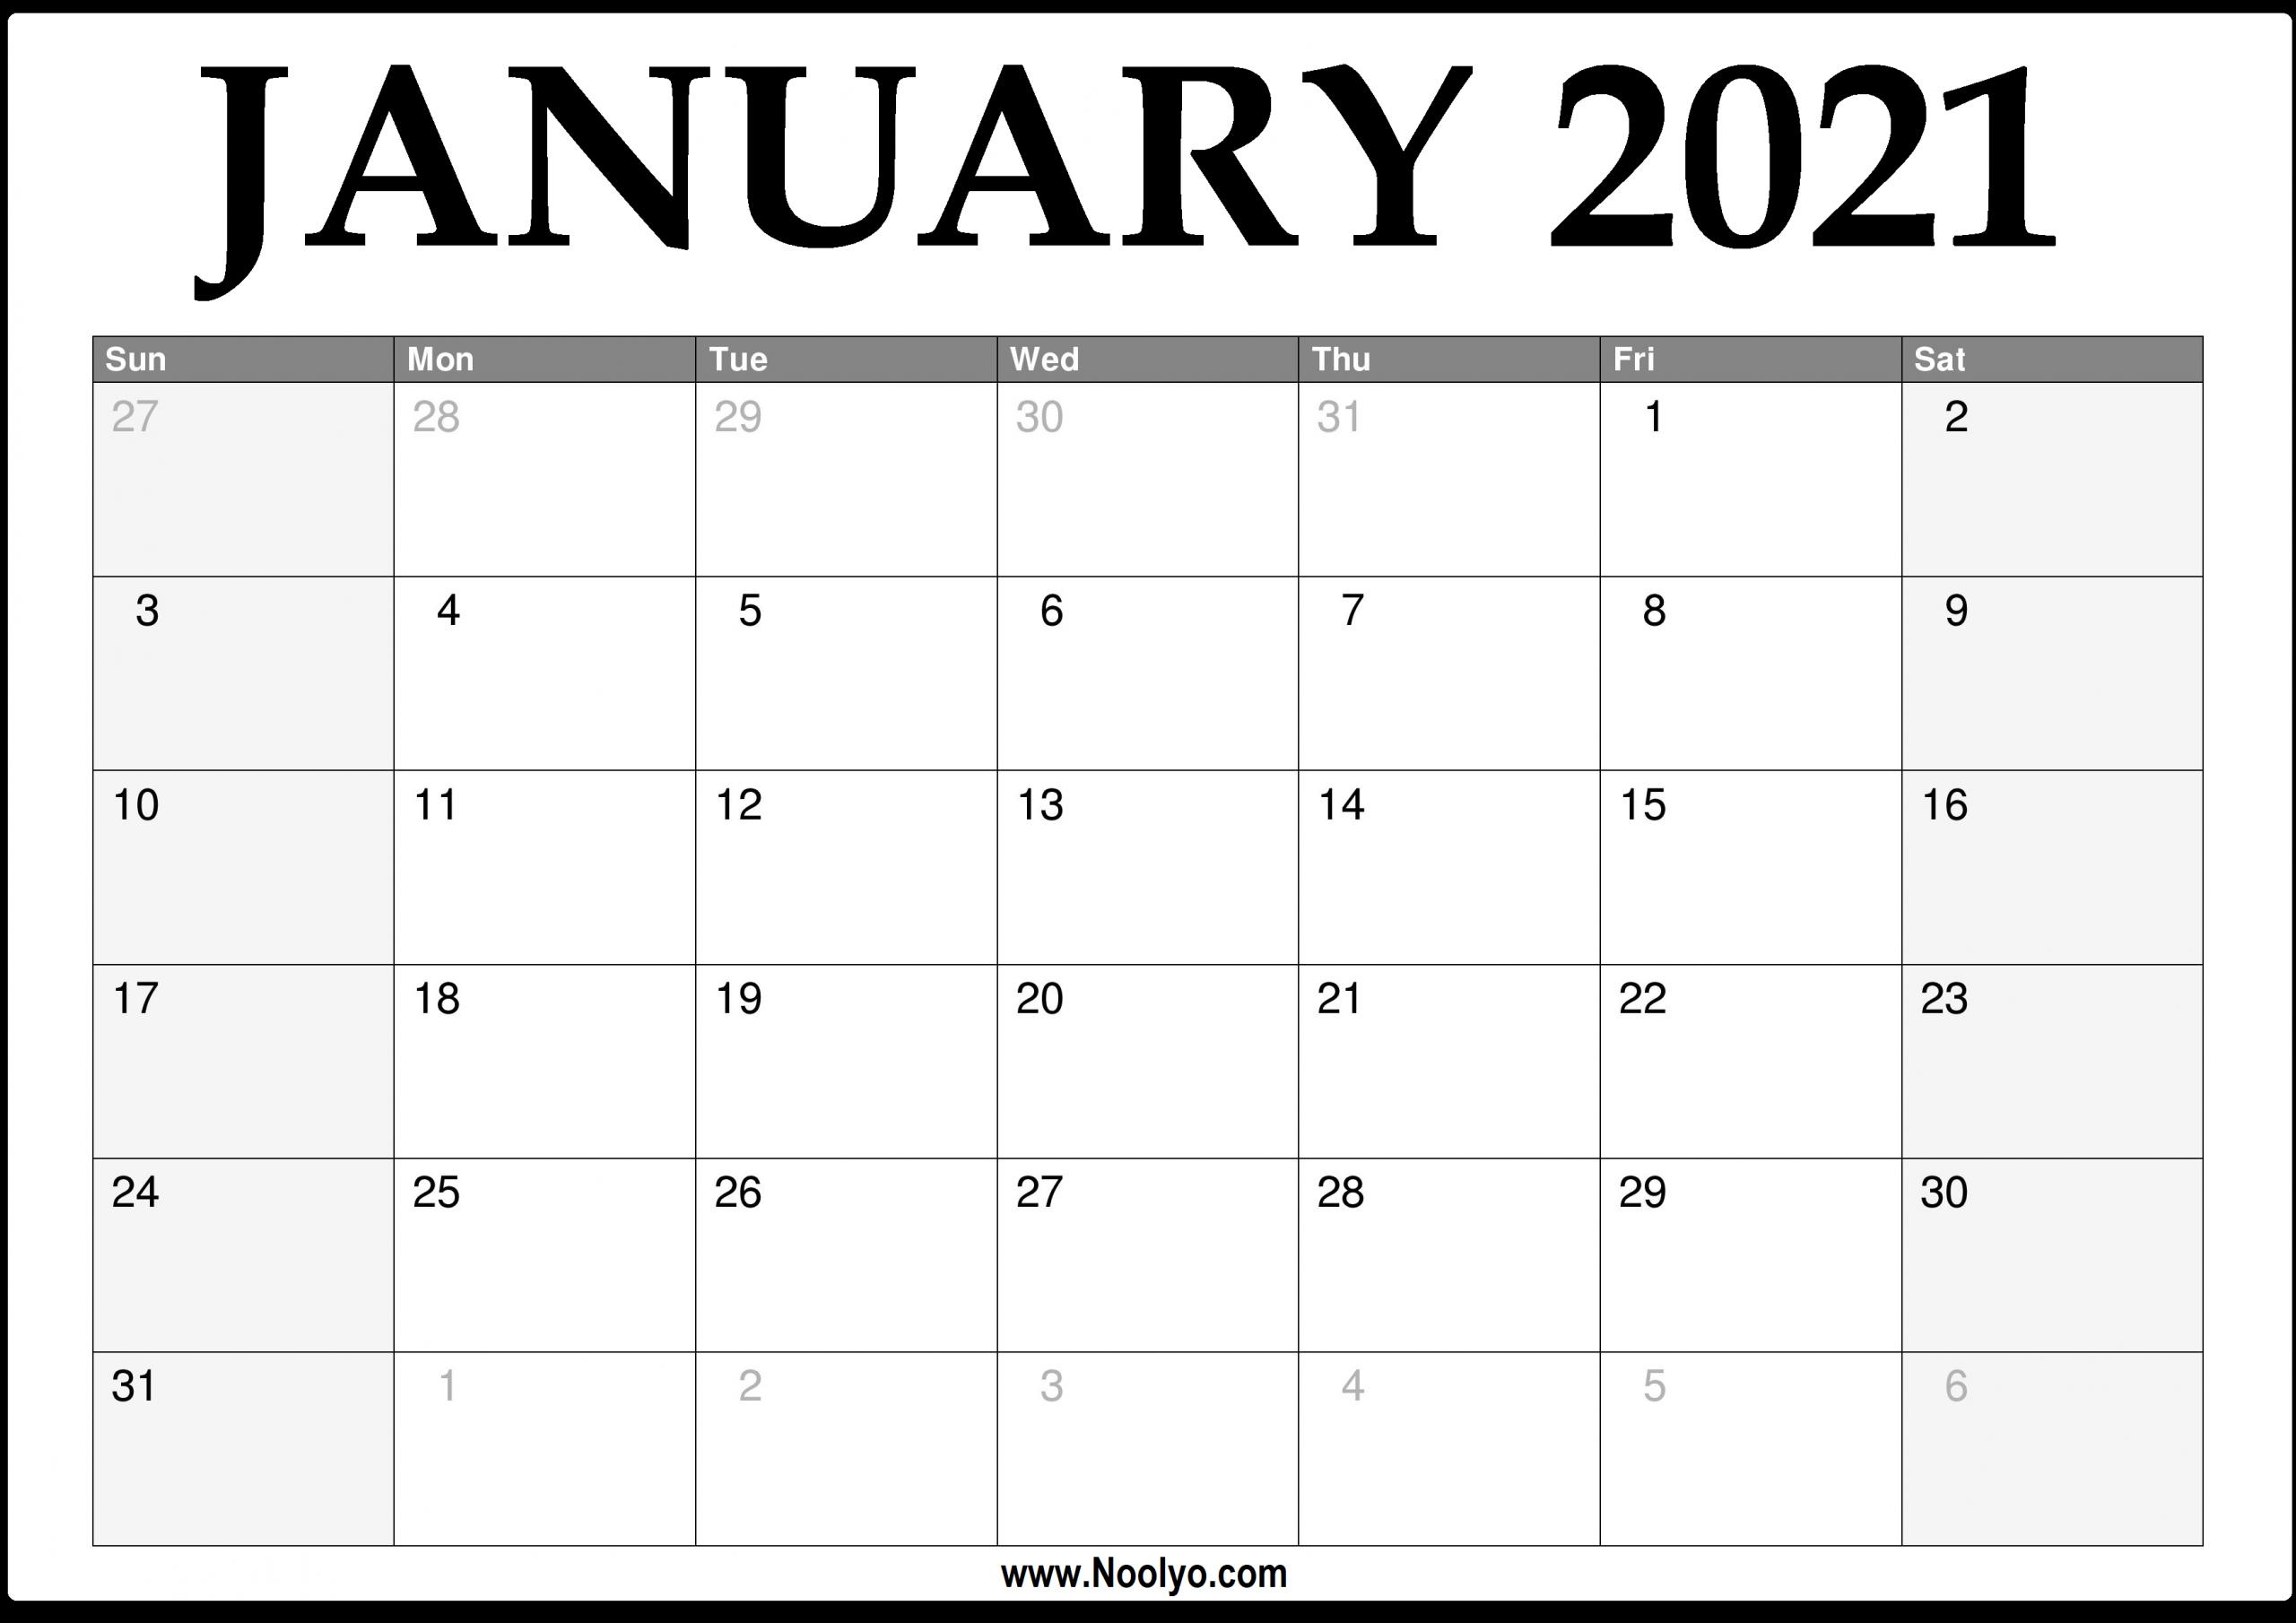 2021 January Calendar Printable Download Free Noolyo 1